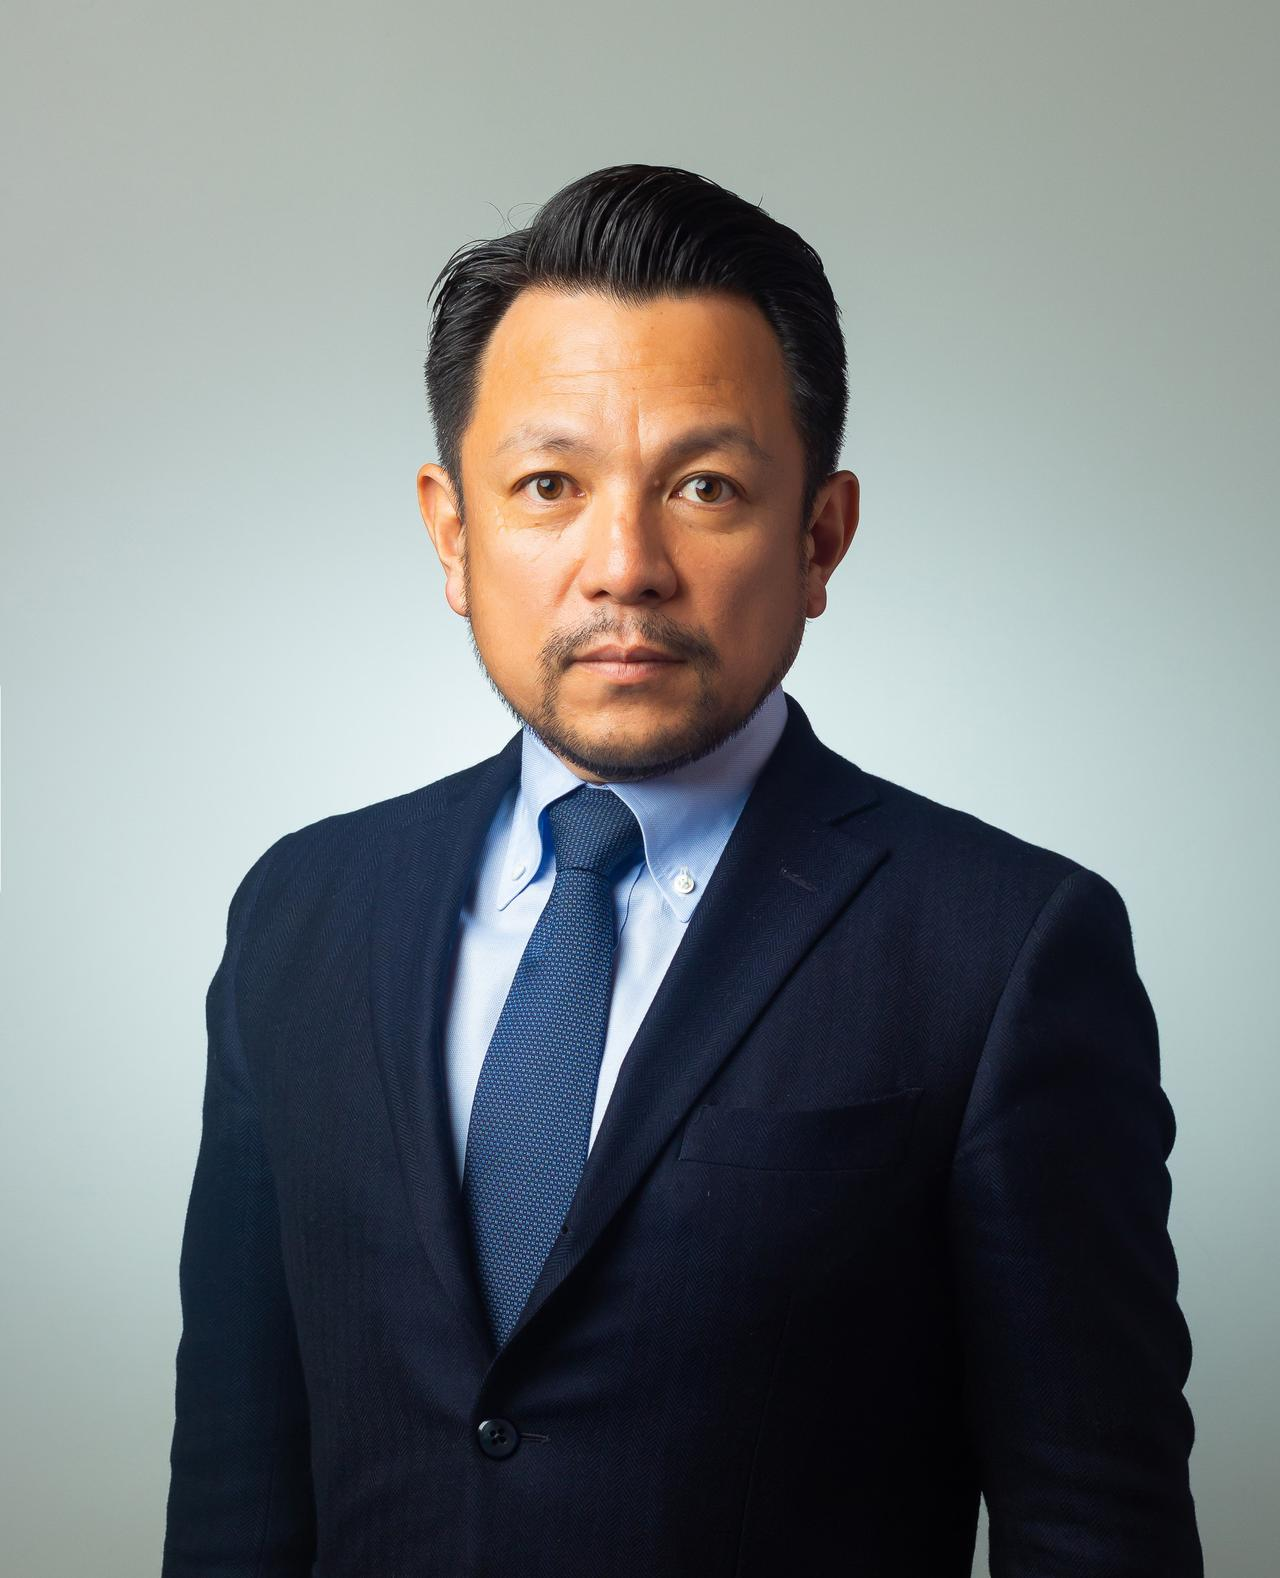 画像: ベタープレイス株式会社 代表取締役 廣居義高 氏